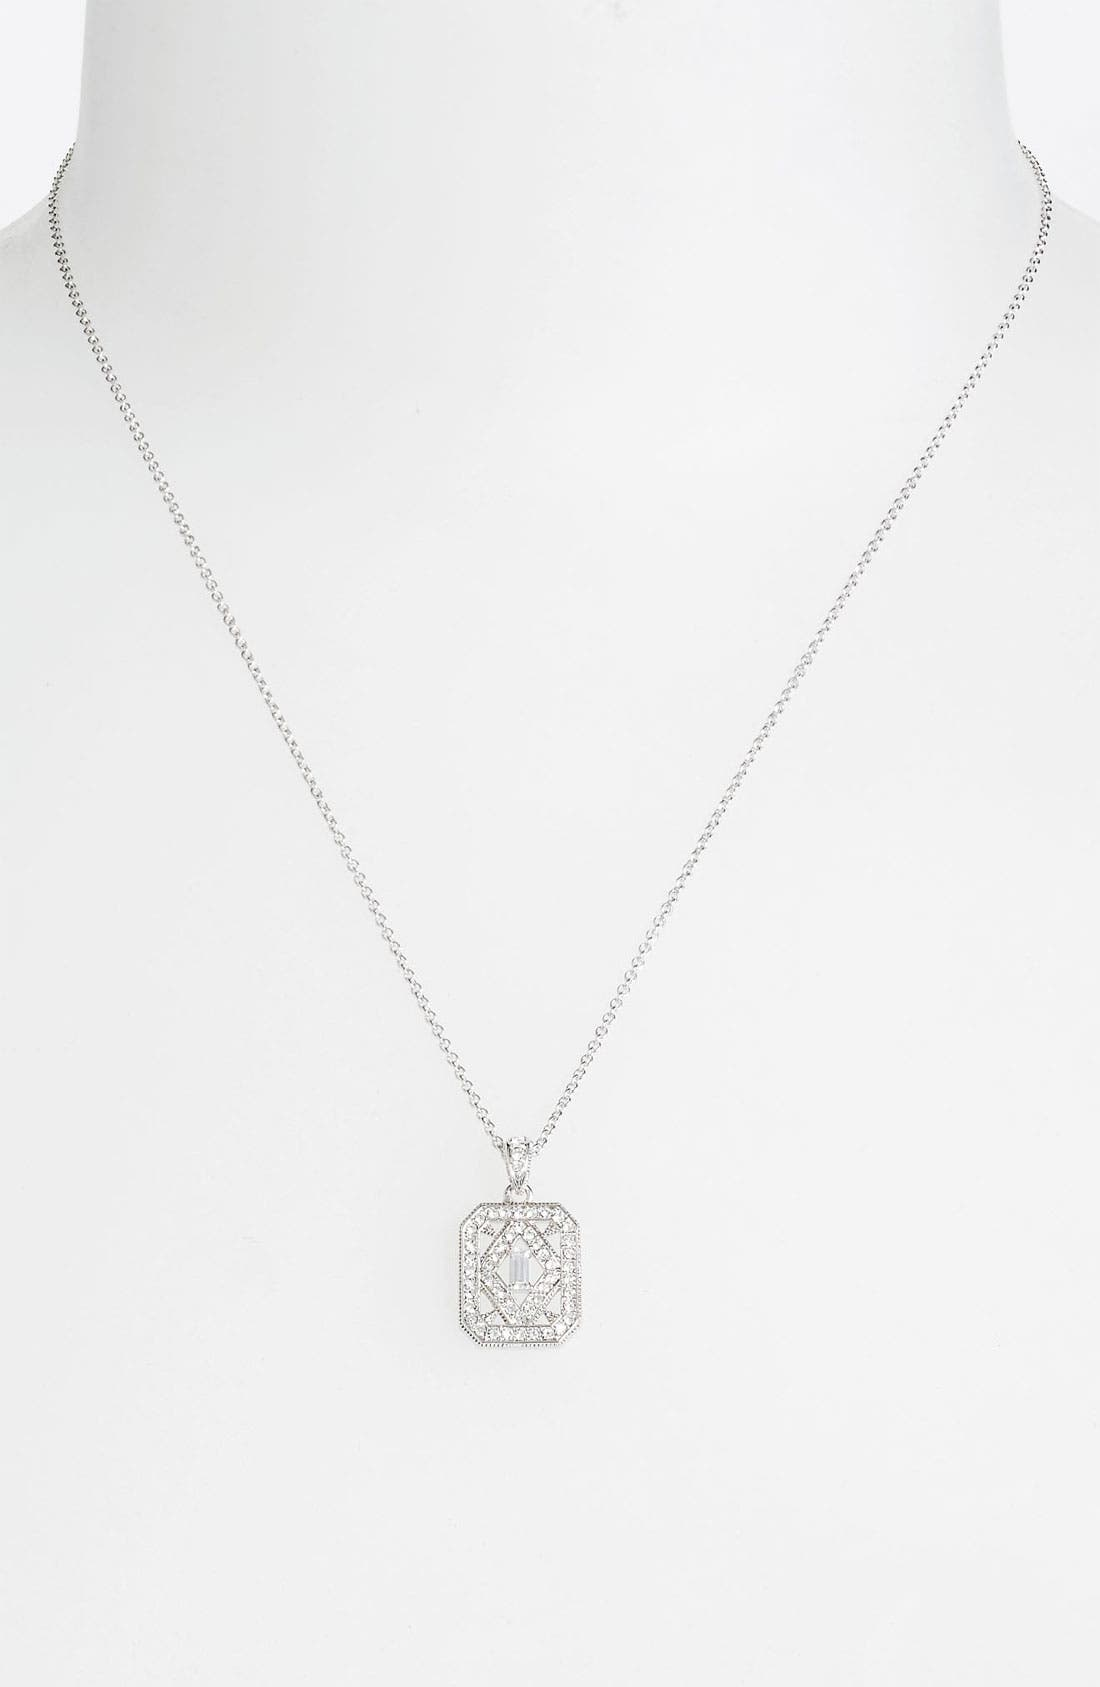 Alternate Image 1 Selected - Nadri 'Art Deco' Pendant Necklace